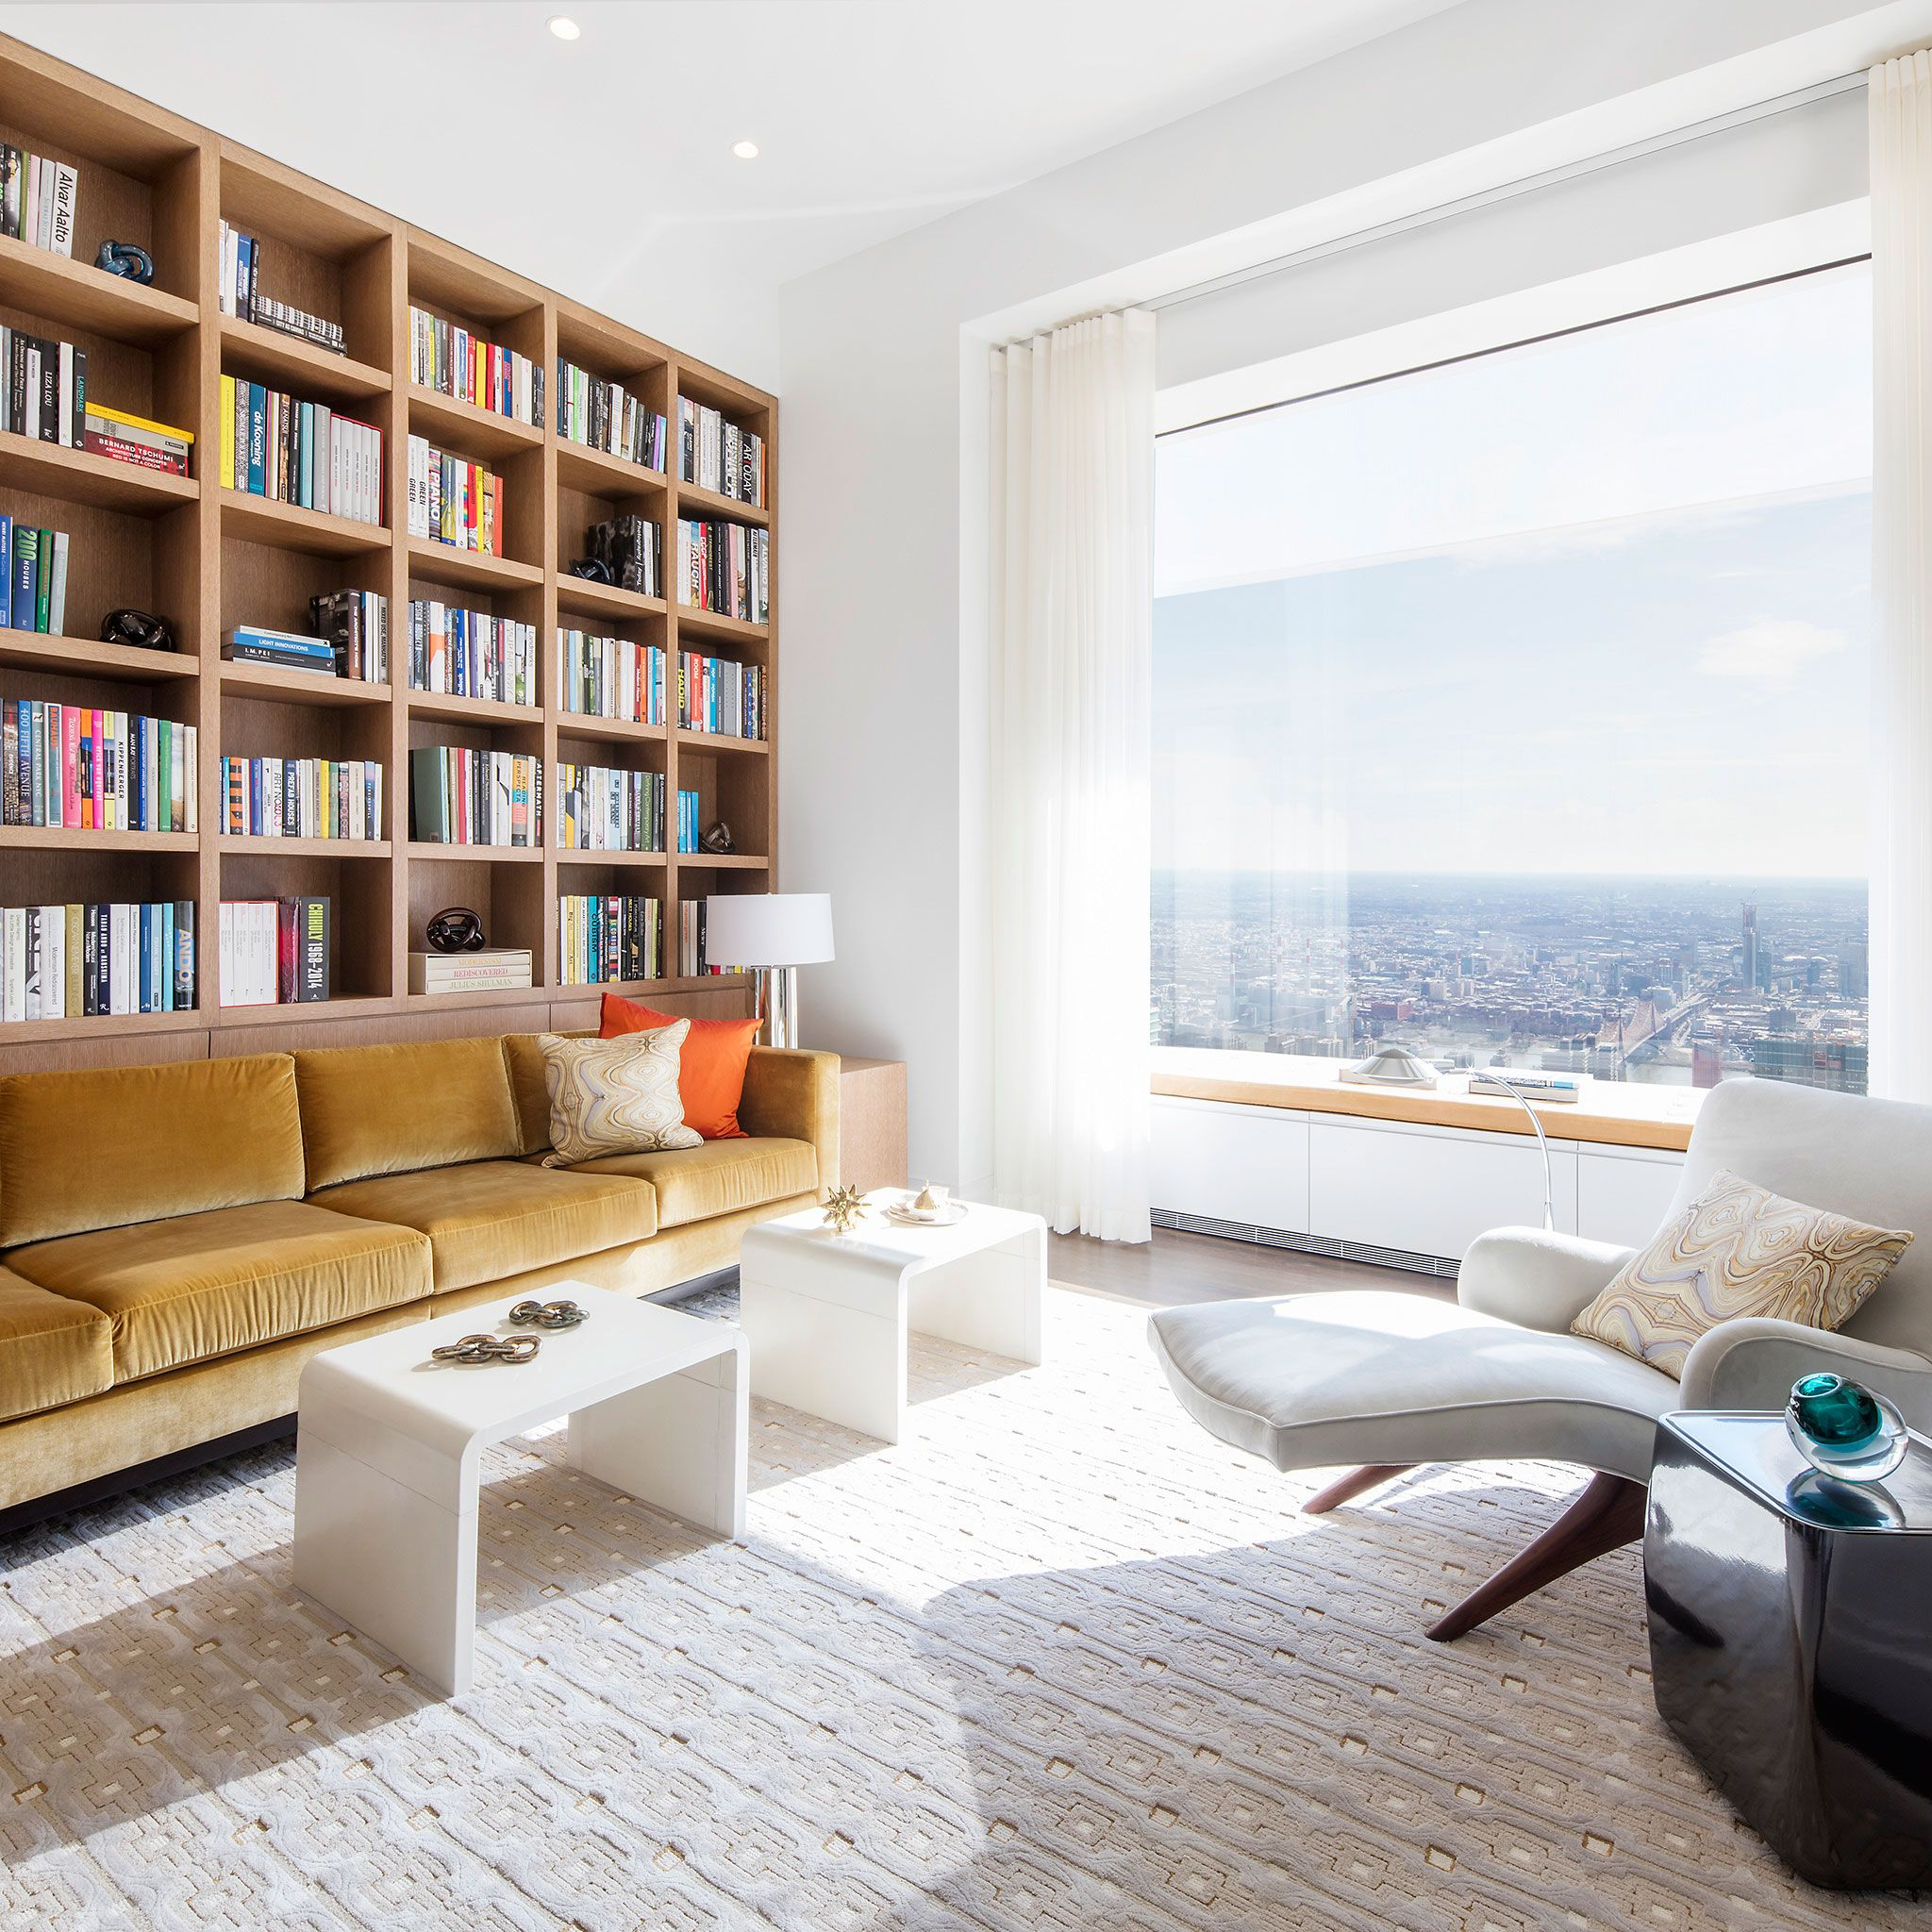 The Avenue By Executive Apartments: 432 Park Avenue's Luxury Condominium Building Is The